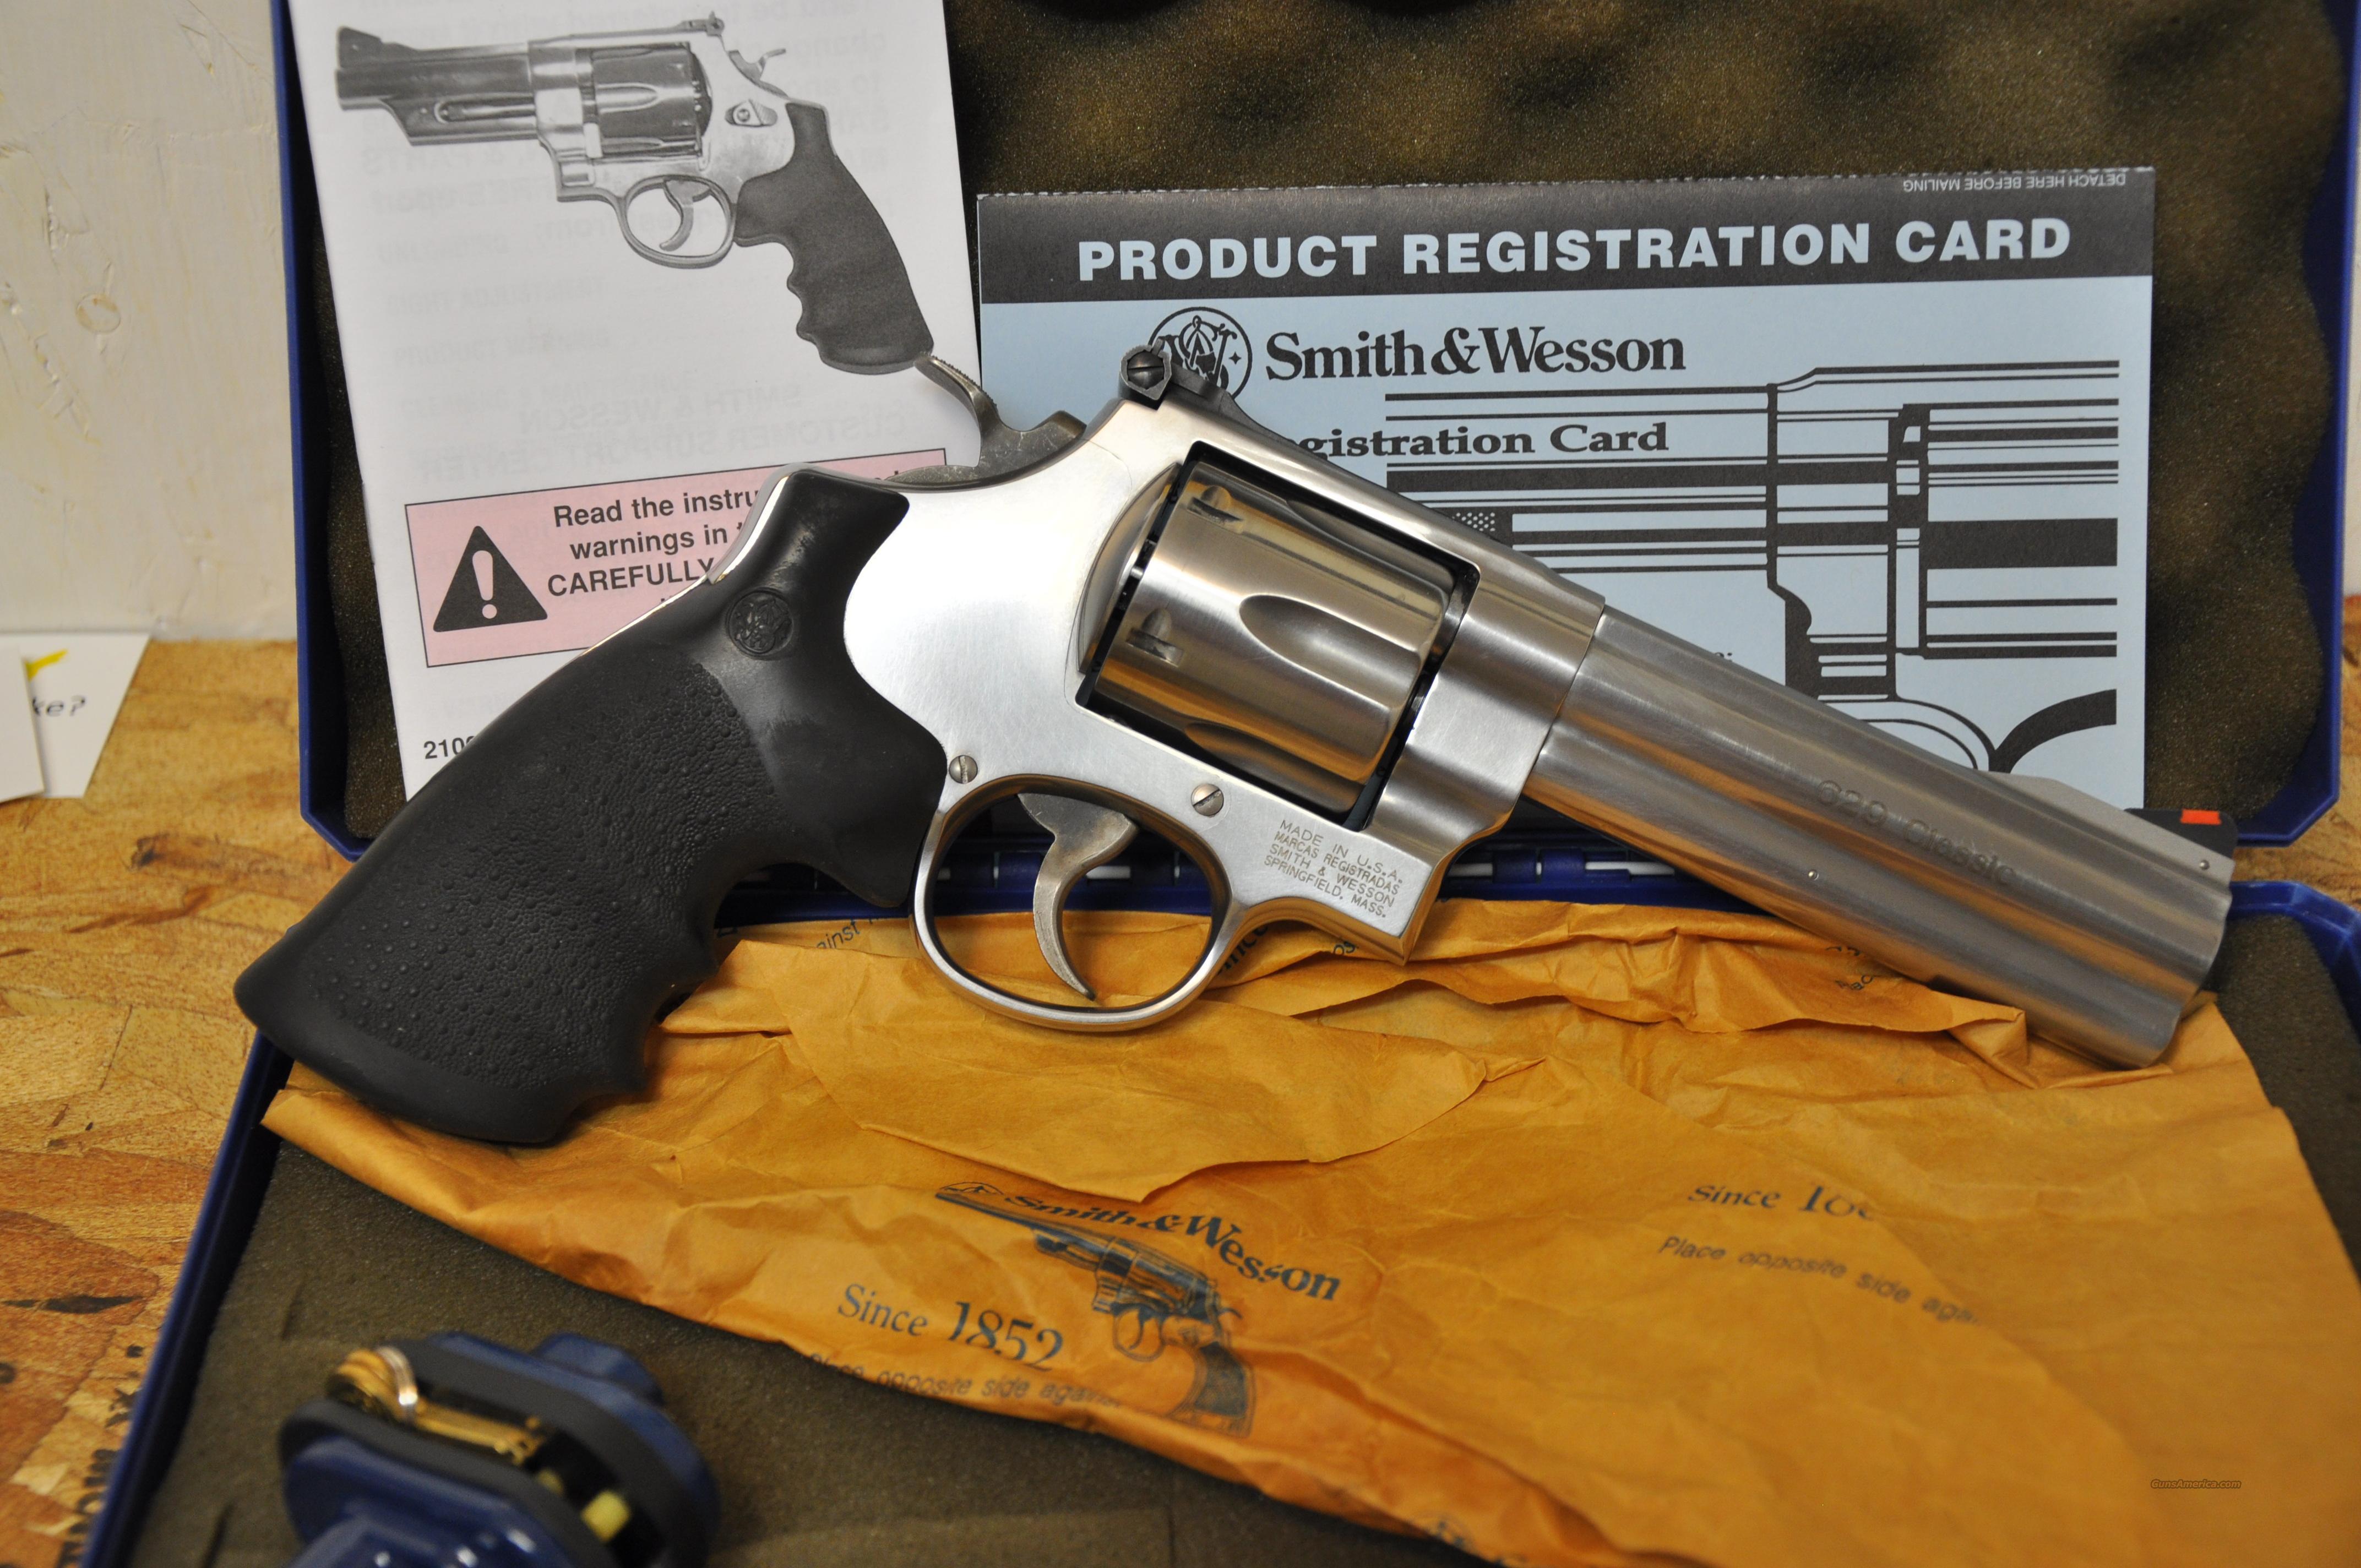 Smith & Wesson Model 629 Classic  Guns > Pistols > Smith & Wesson Revolvers > Model 629